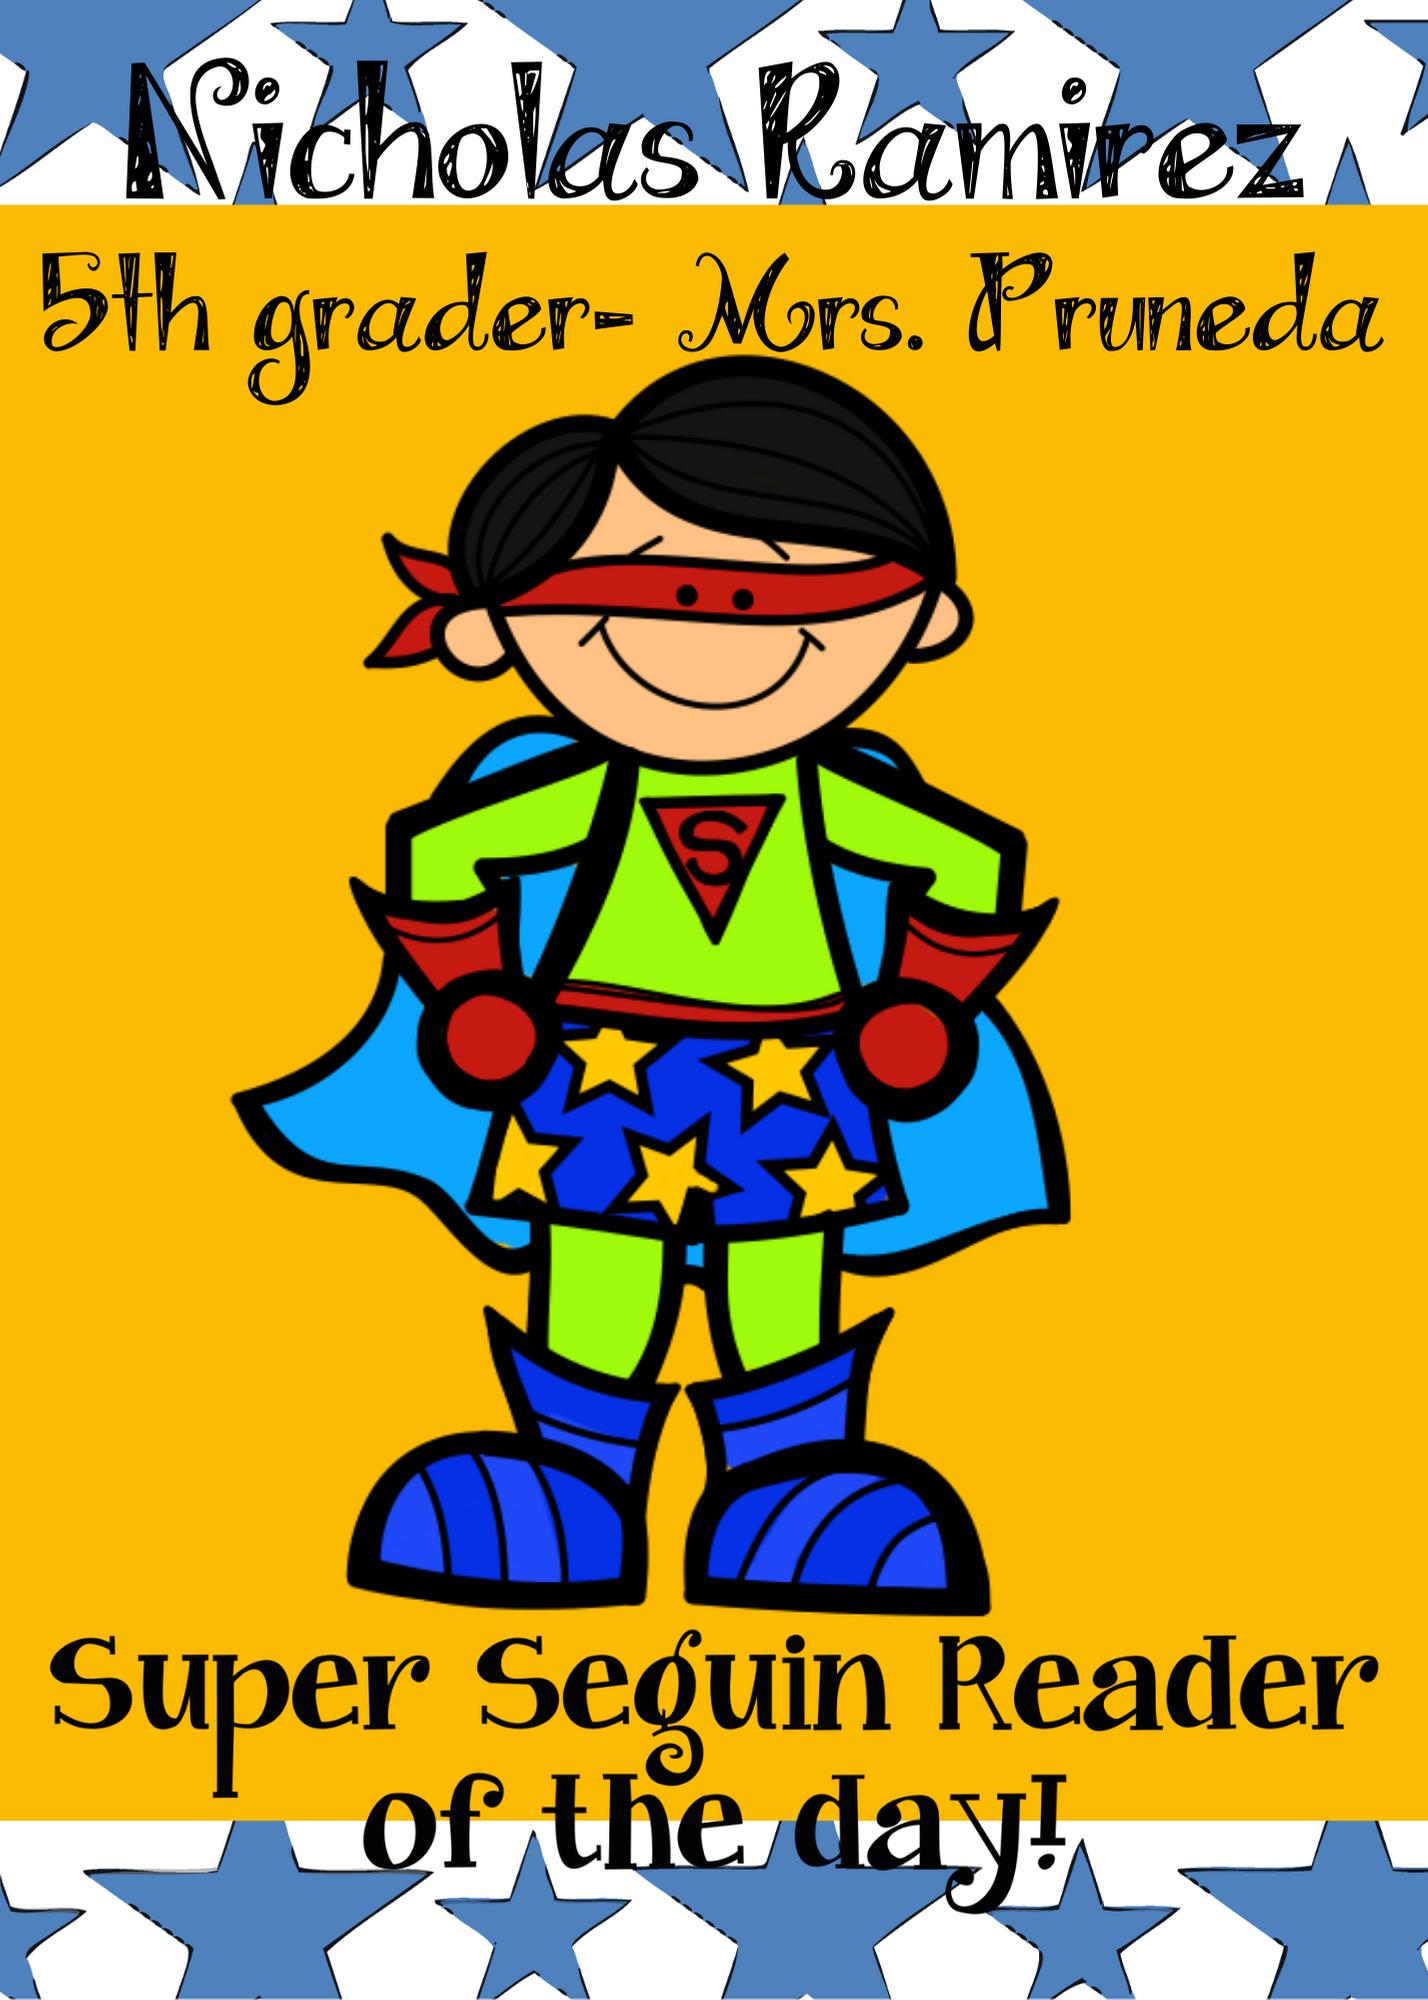 Super Seguin Reader